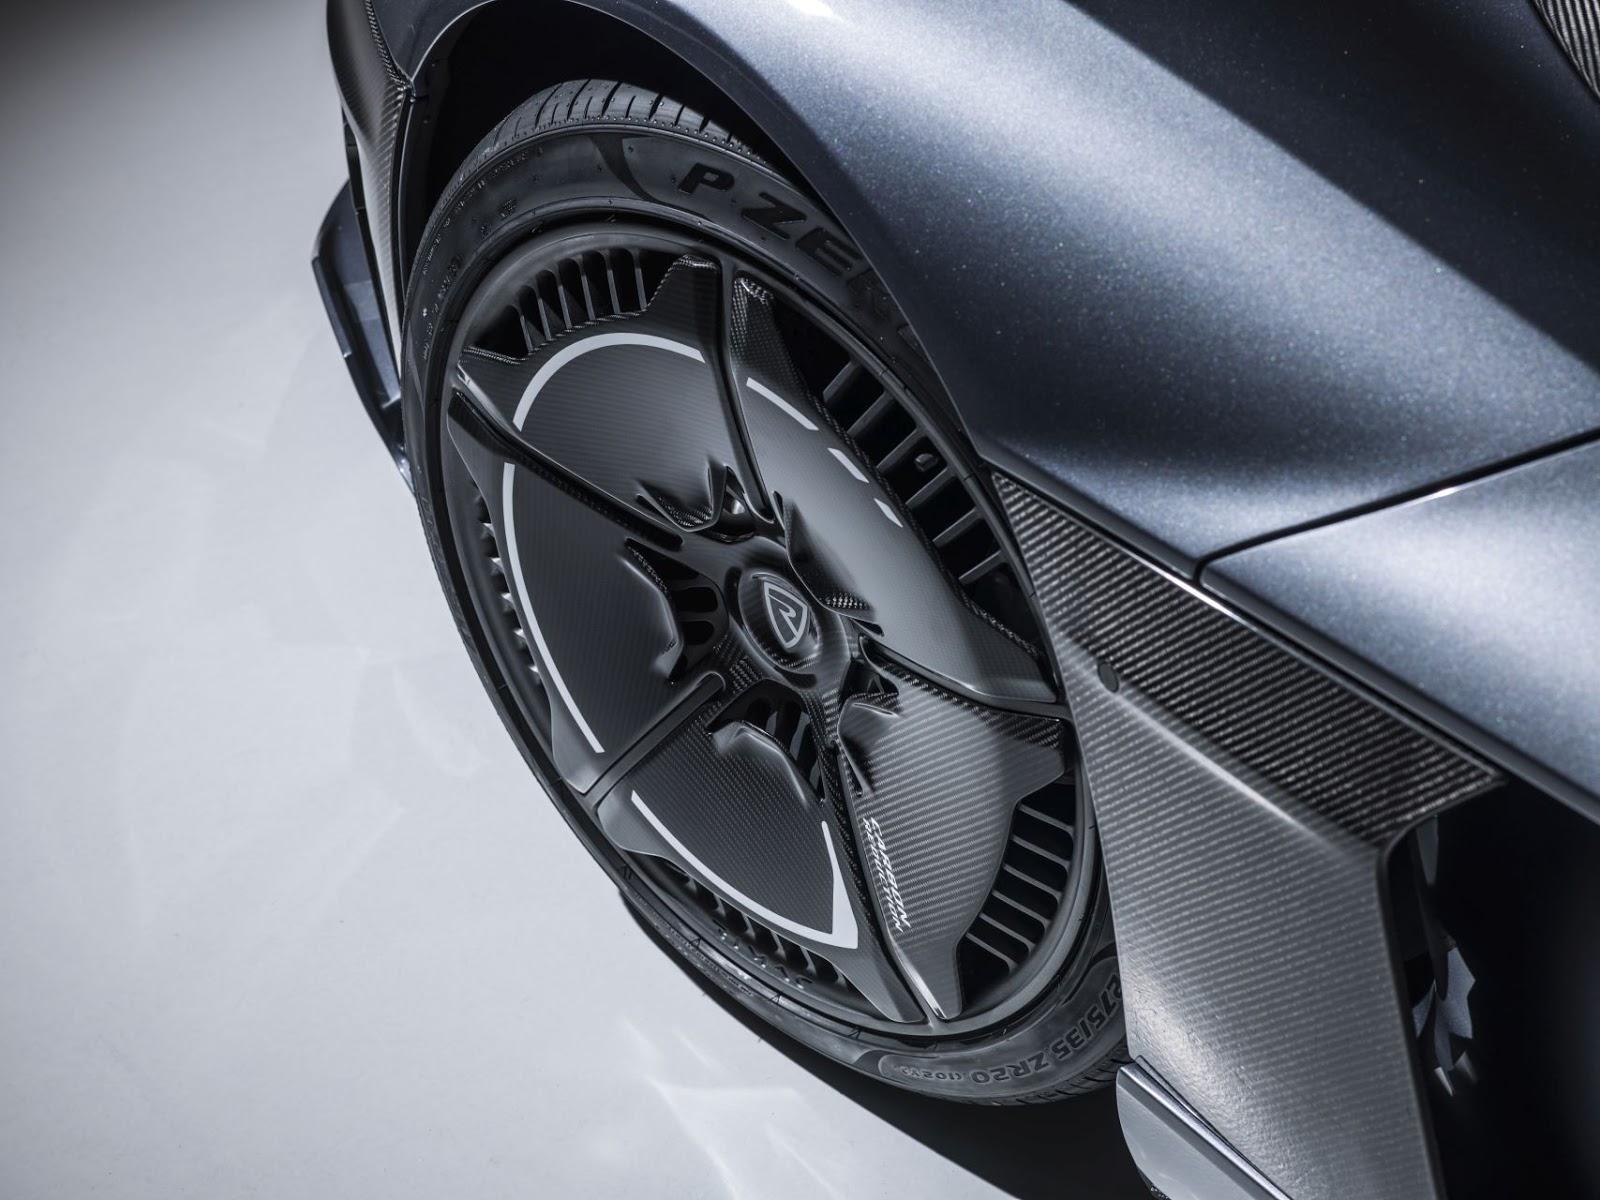 c two aero wheel Rimac C Two. Η νέα φυλή στα hypercars, έρχεται με 1900 ίππους. C Two, Electric cars, hypercar, Rimac, zblog